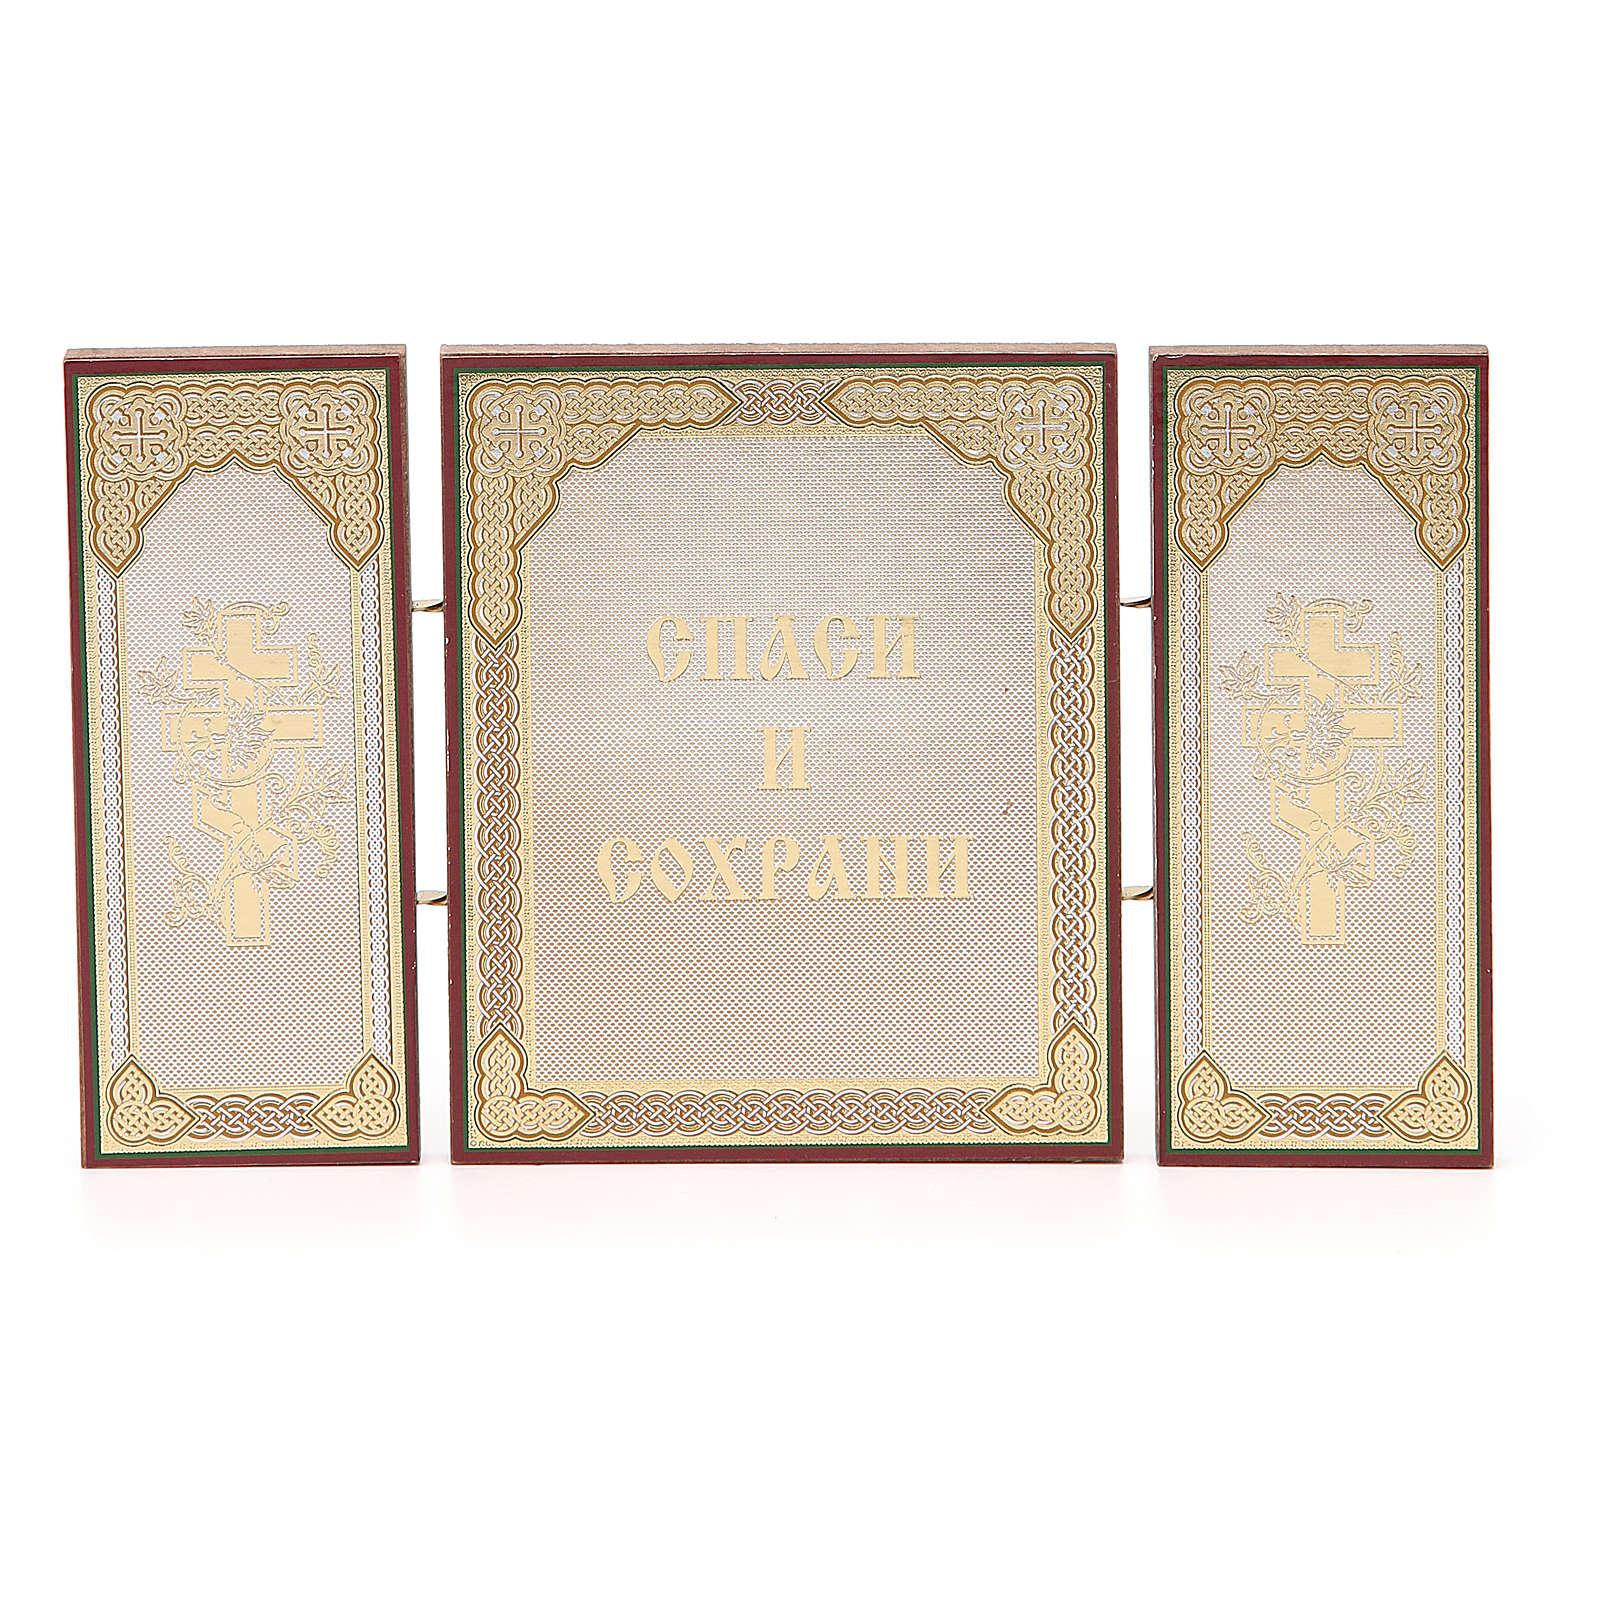 Triptyque russe bois Zhirovitskaya 21x12 cm 3